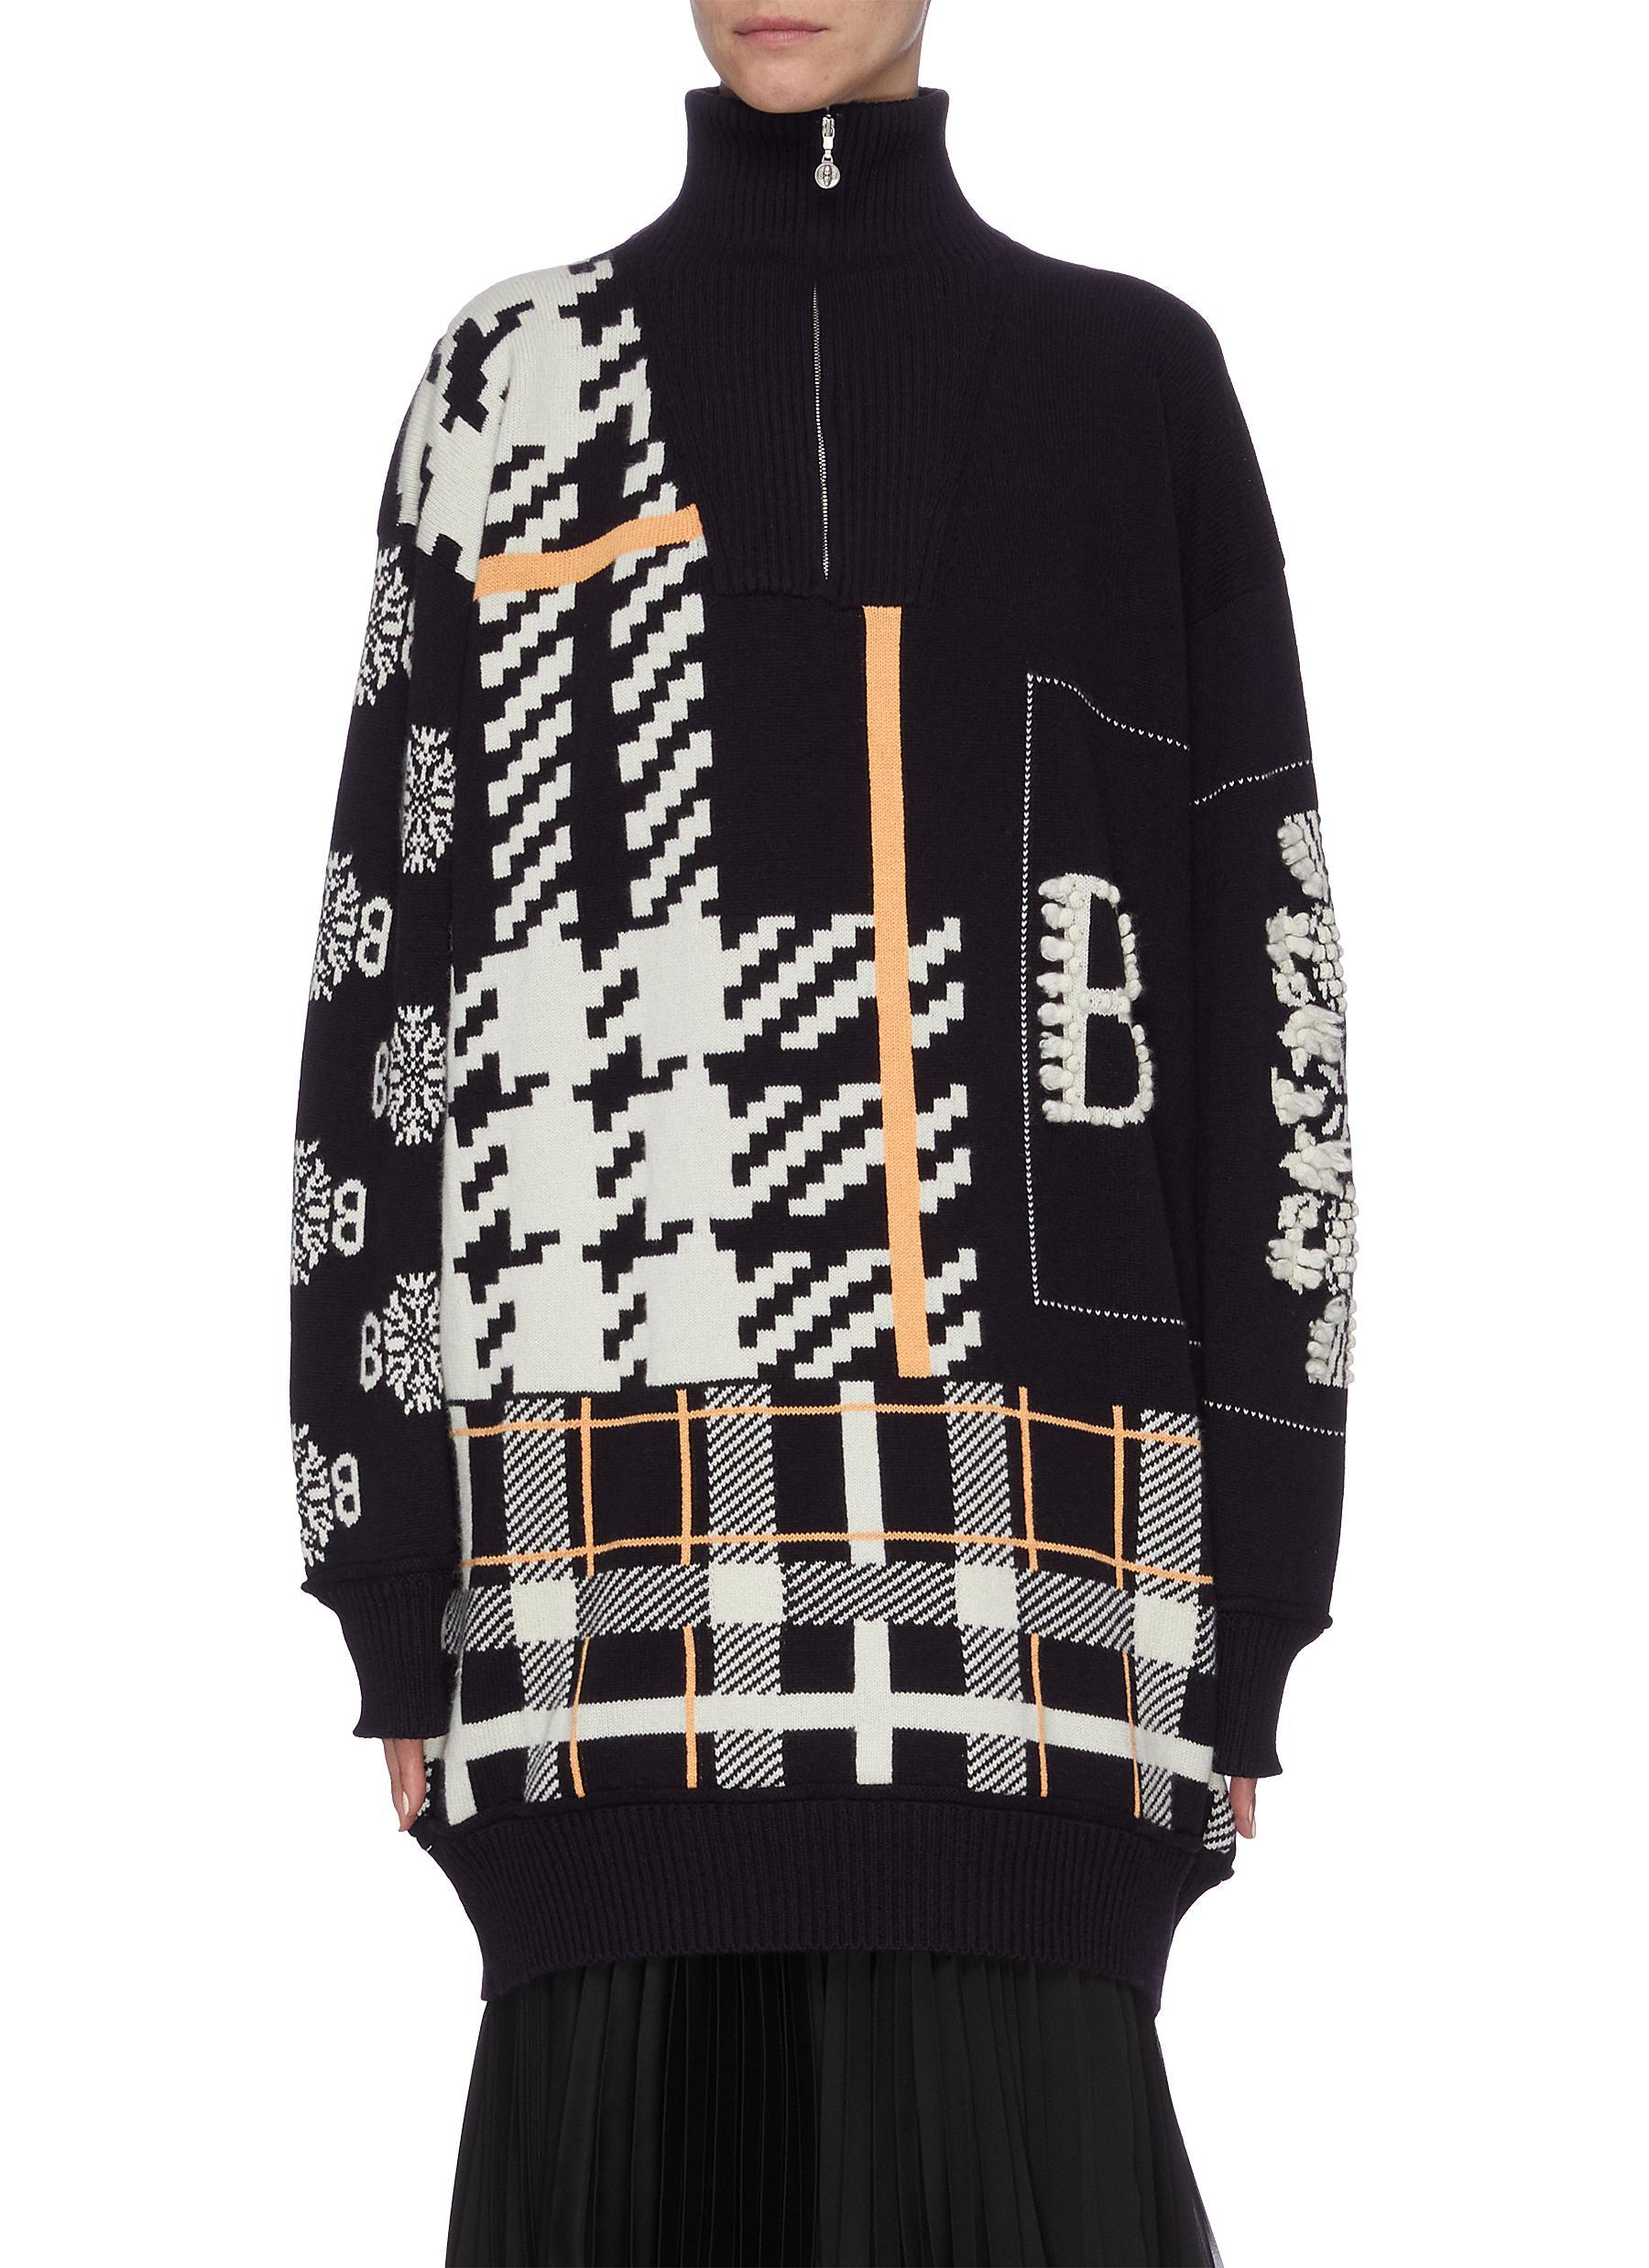 Mix pattern cashmere half-zip turtleneck sweater by Barrie